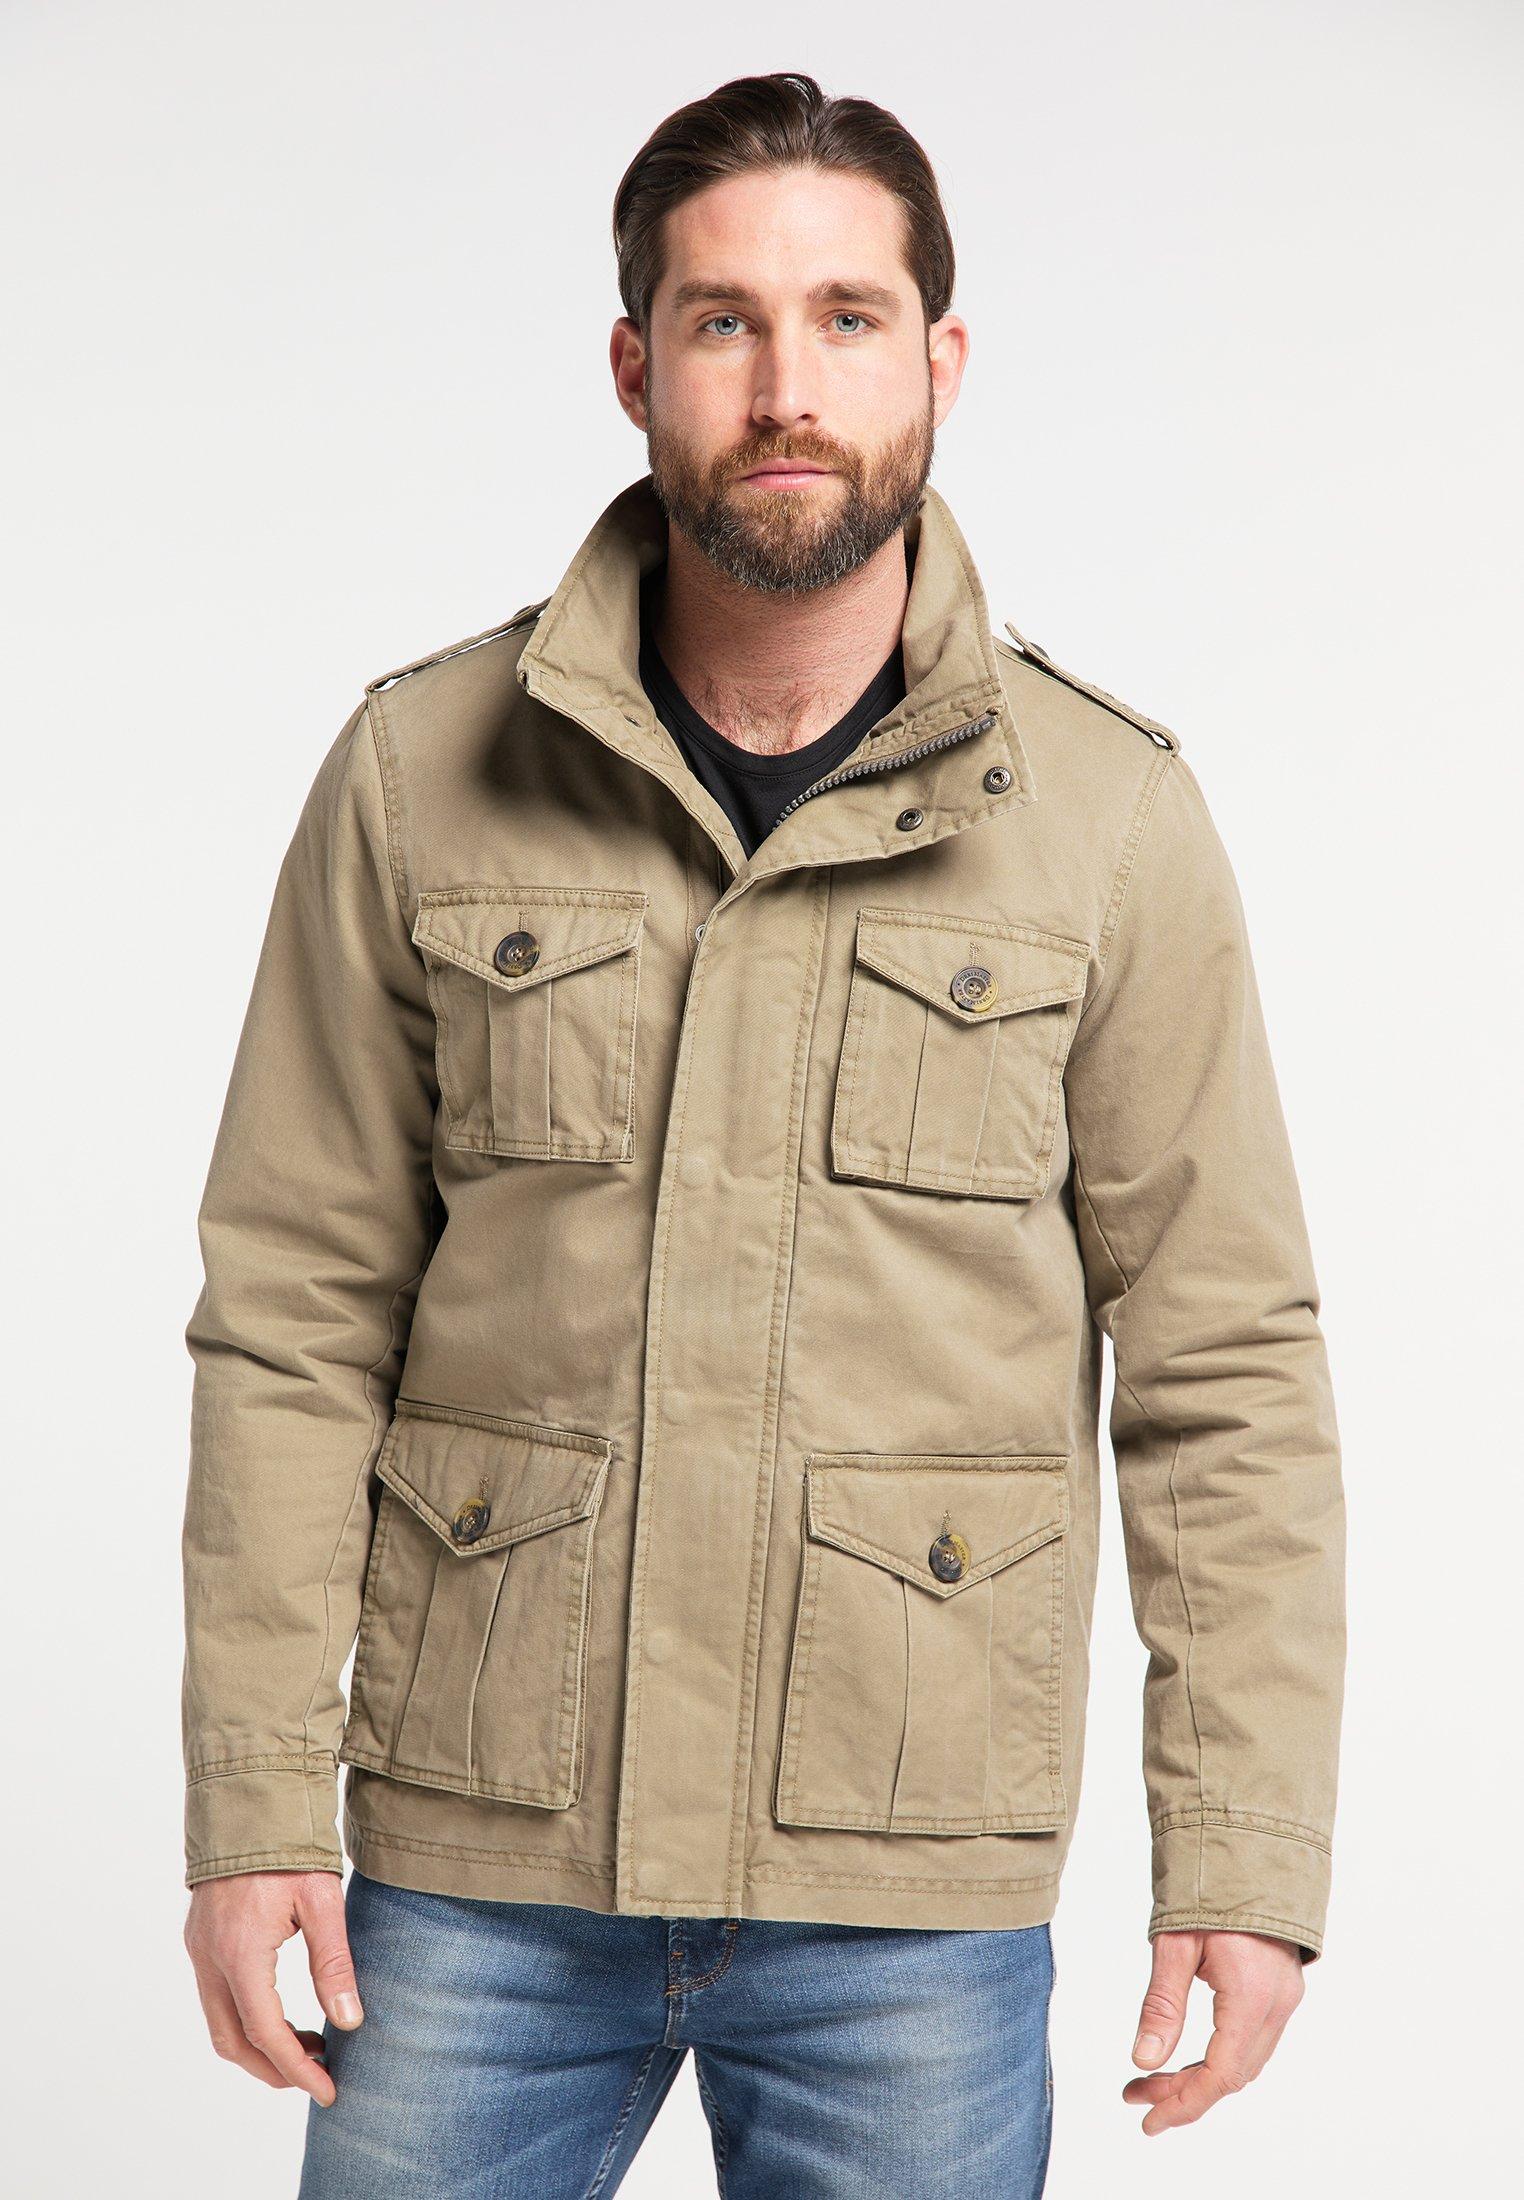 Super Men's Clothing DreiMaster Summer jacket brown b5wPTnICi